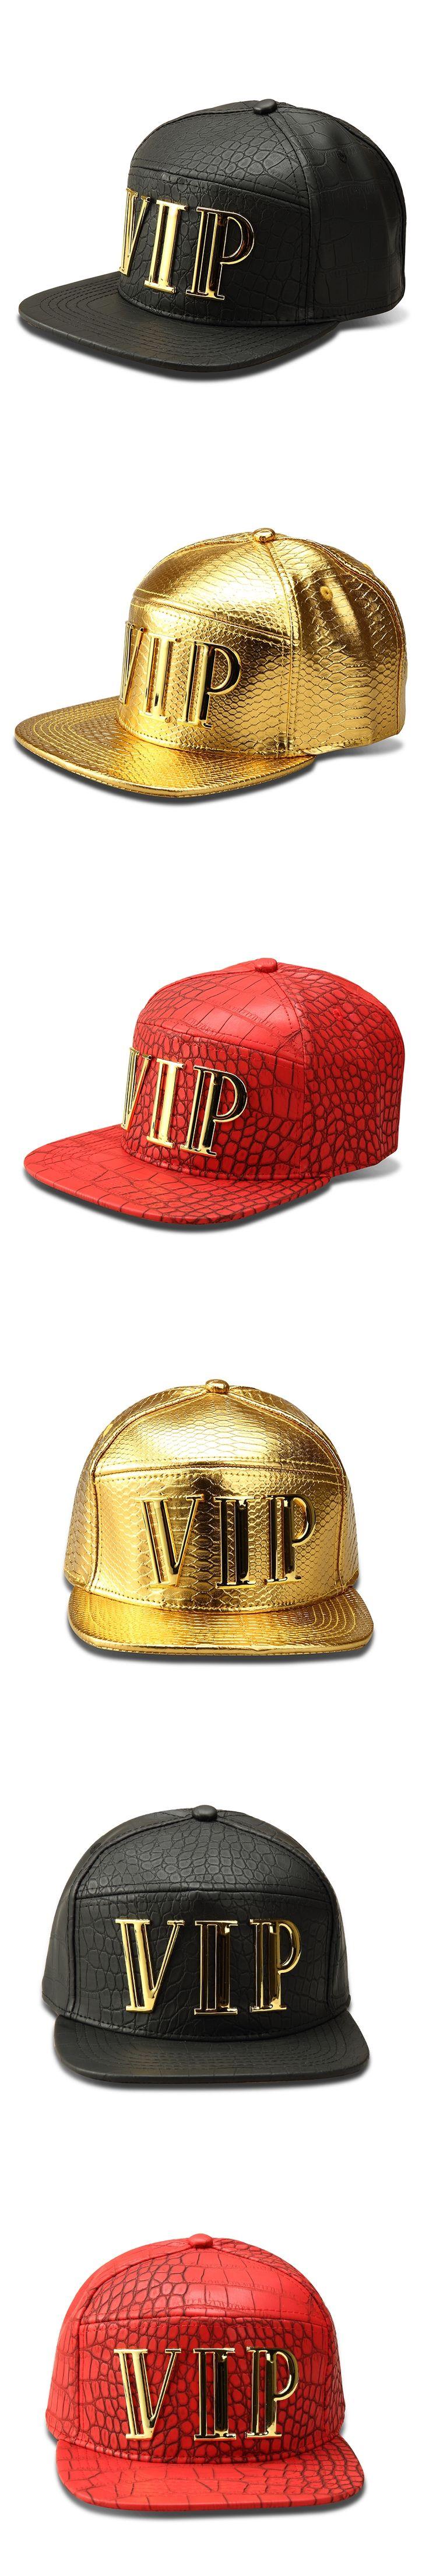 NYUK New Arrival Snapback Baseball Cap Hat Hip Hop PU Leather Caps Bones For Men Women Sports Fashion With Metal Letter VIP Logo